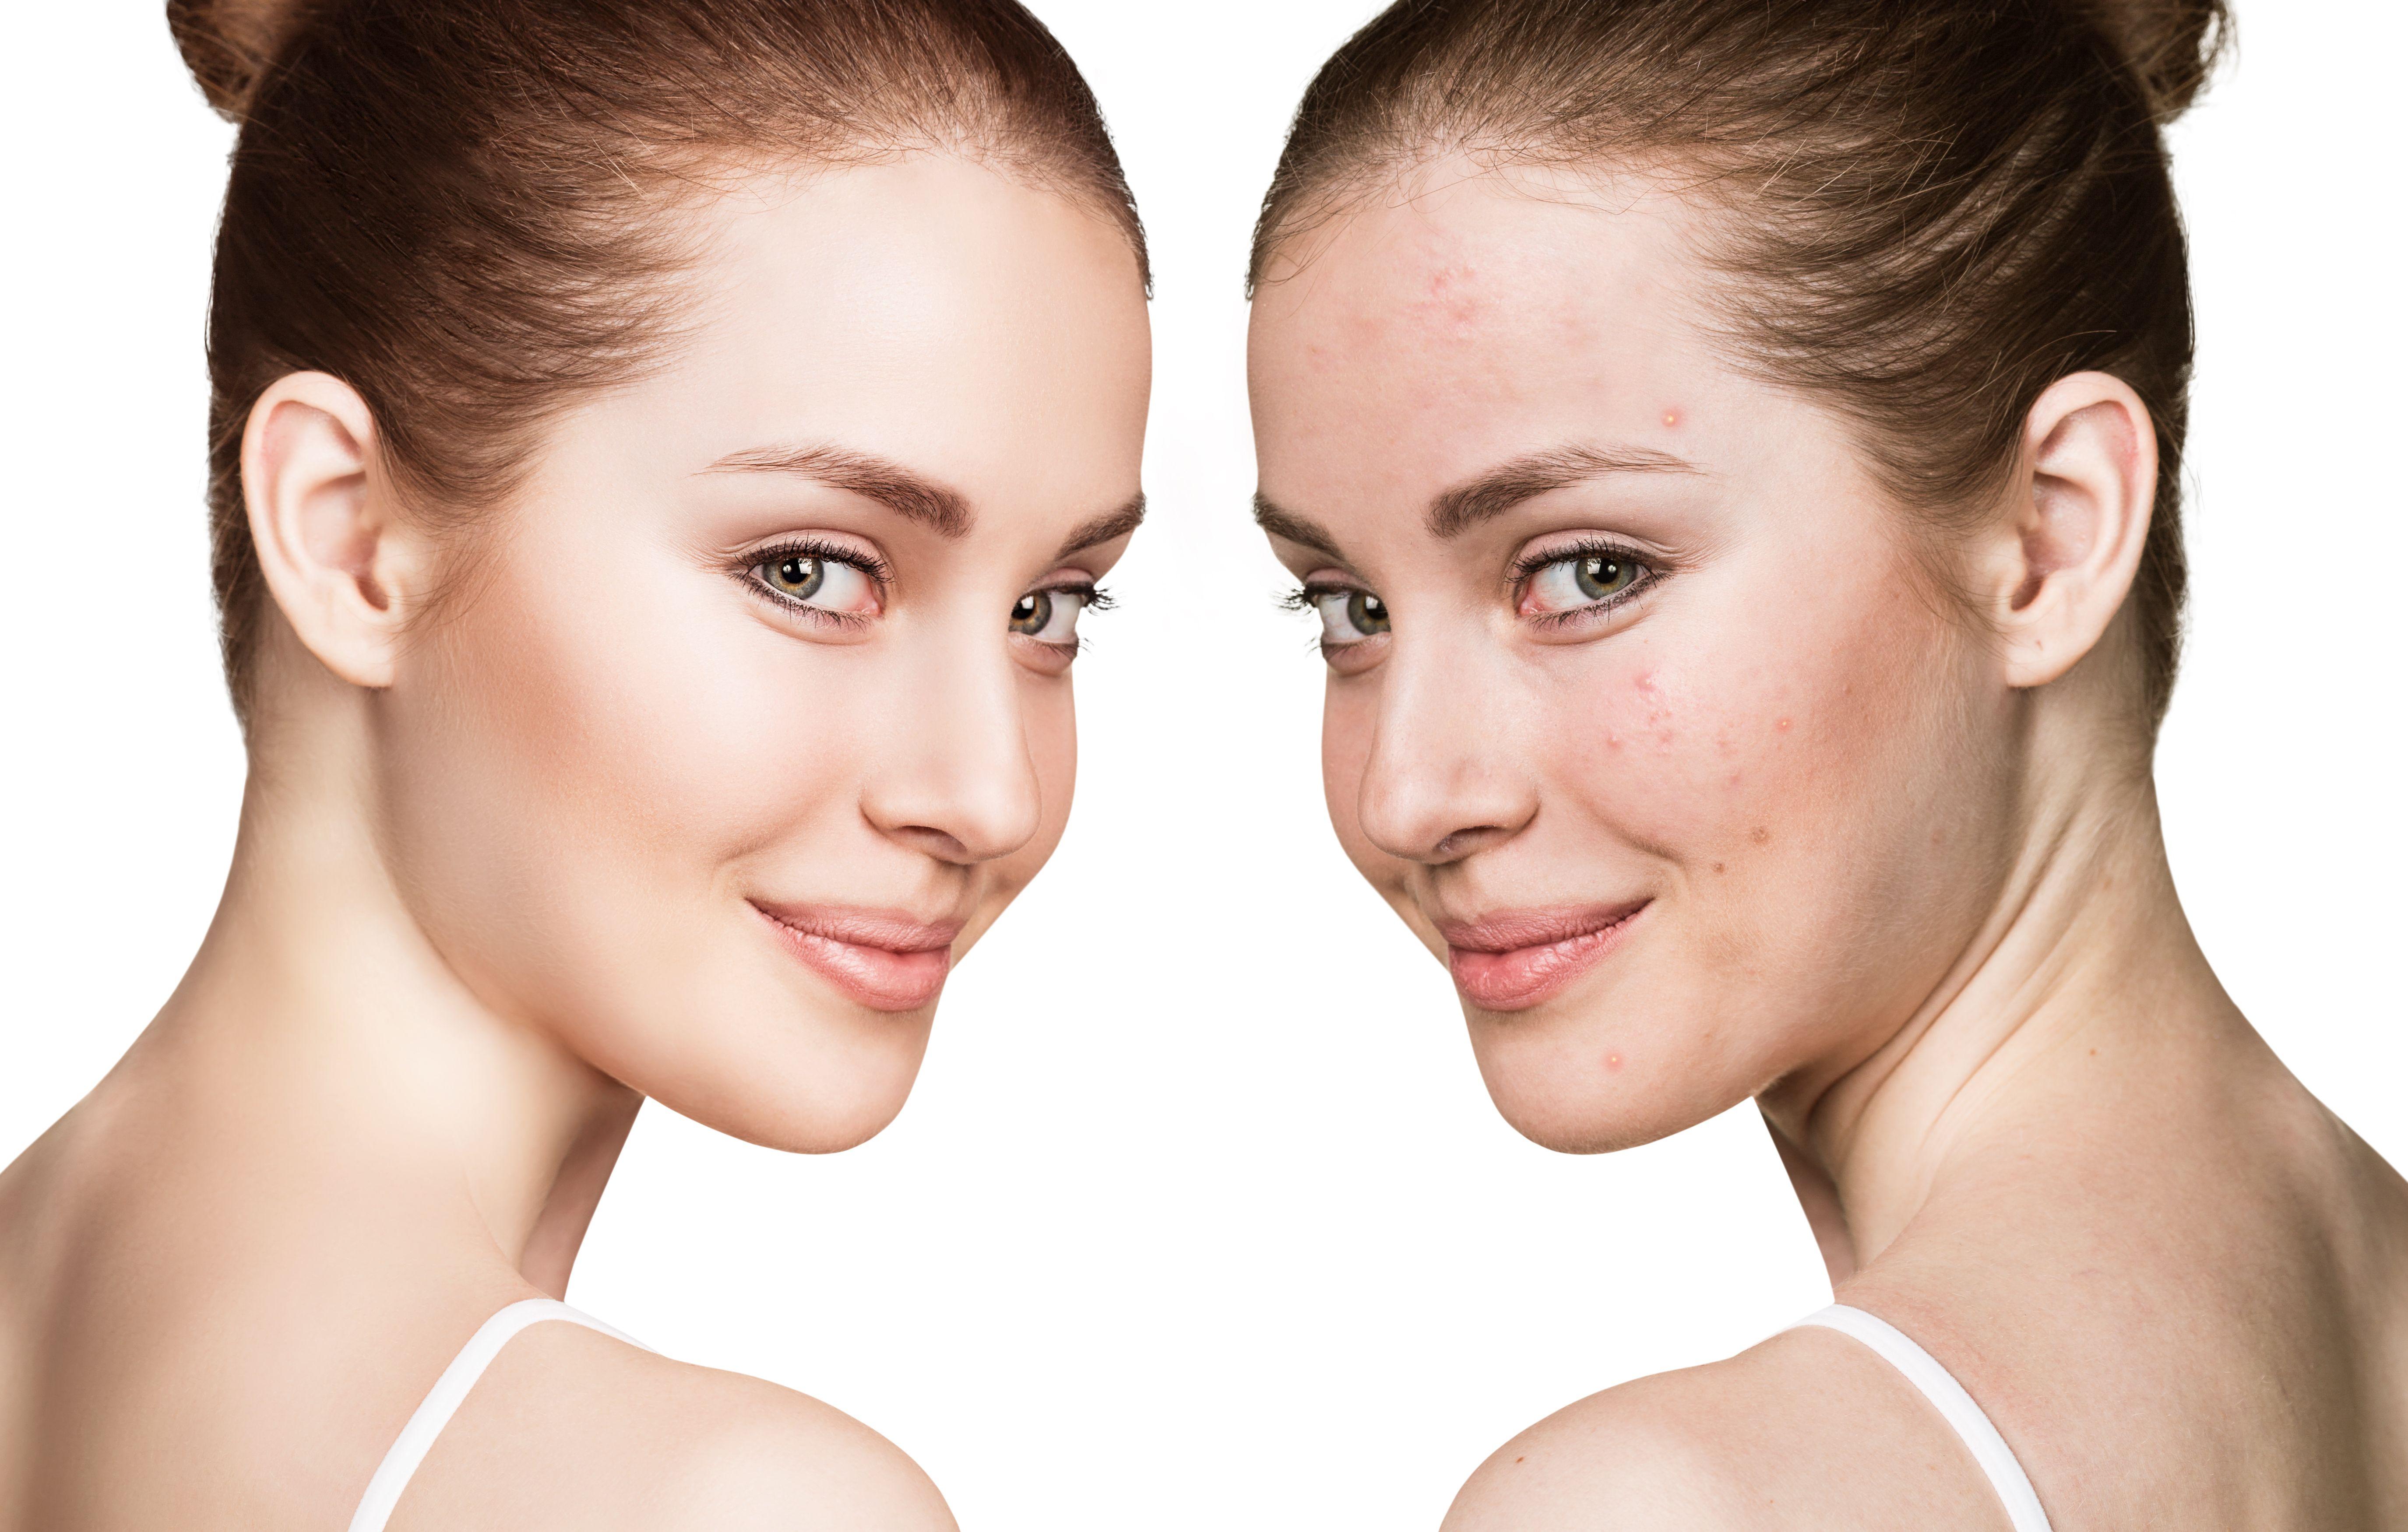 Línea biológica para pieles acneicas: Tratamientos de Vida con Estética